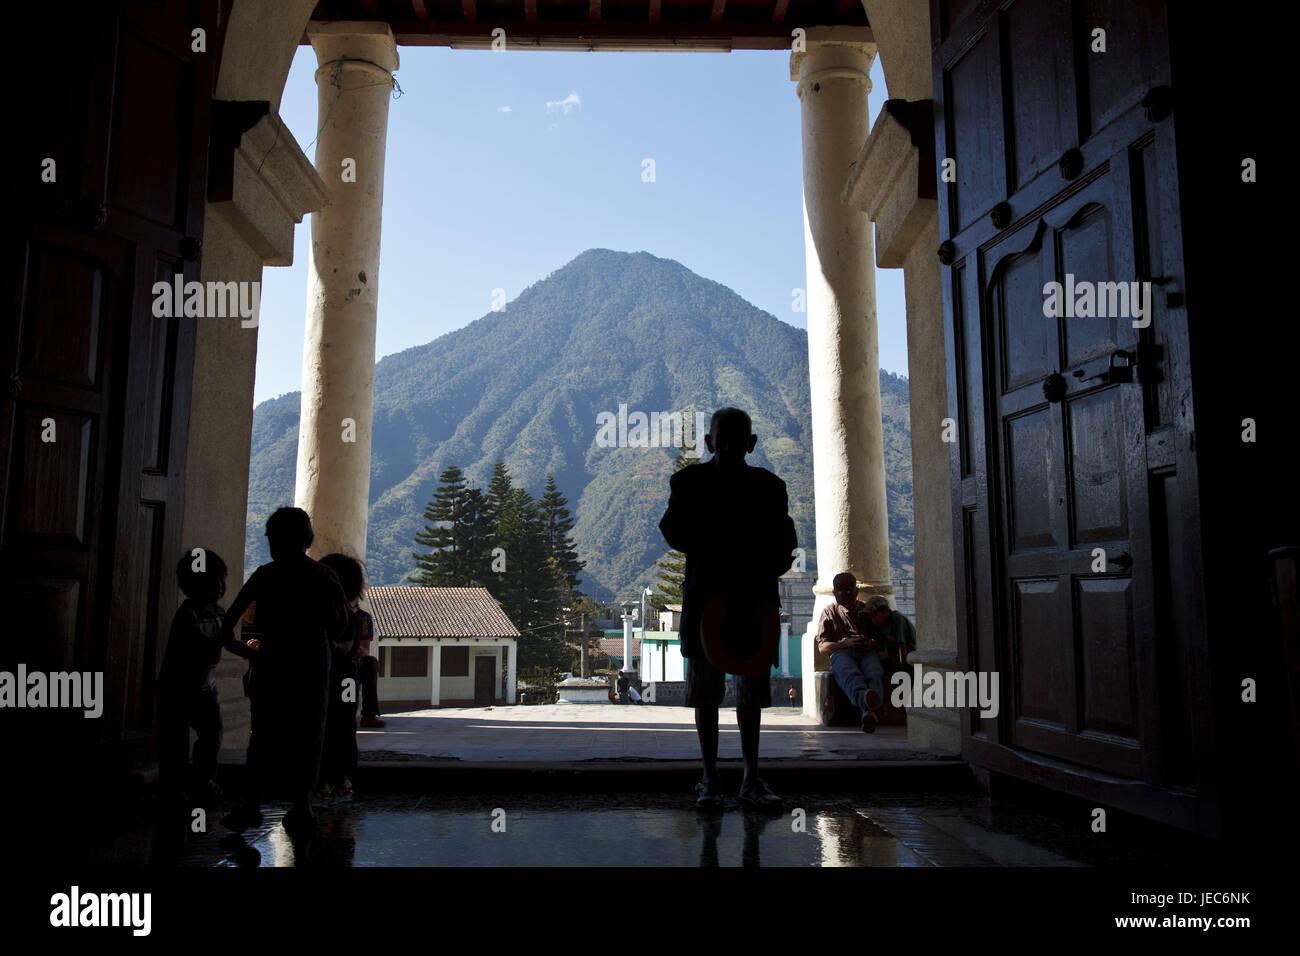 Guatemala, Atitlan lake, church, person, Maya, volcano, no model release, no property release, - Stock Image